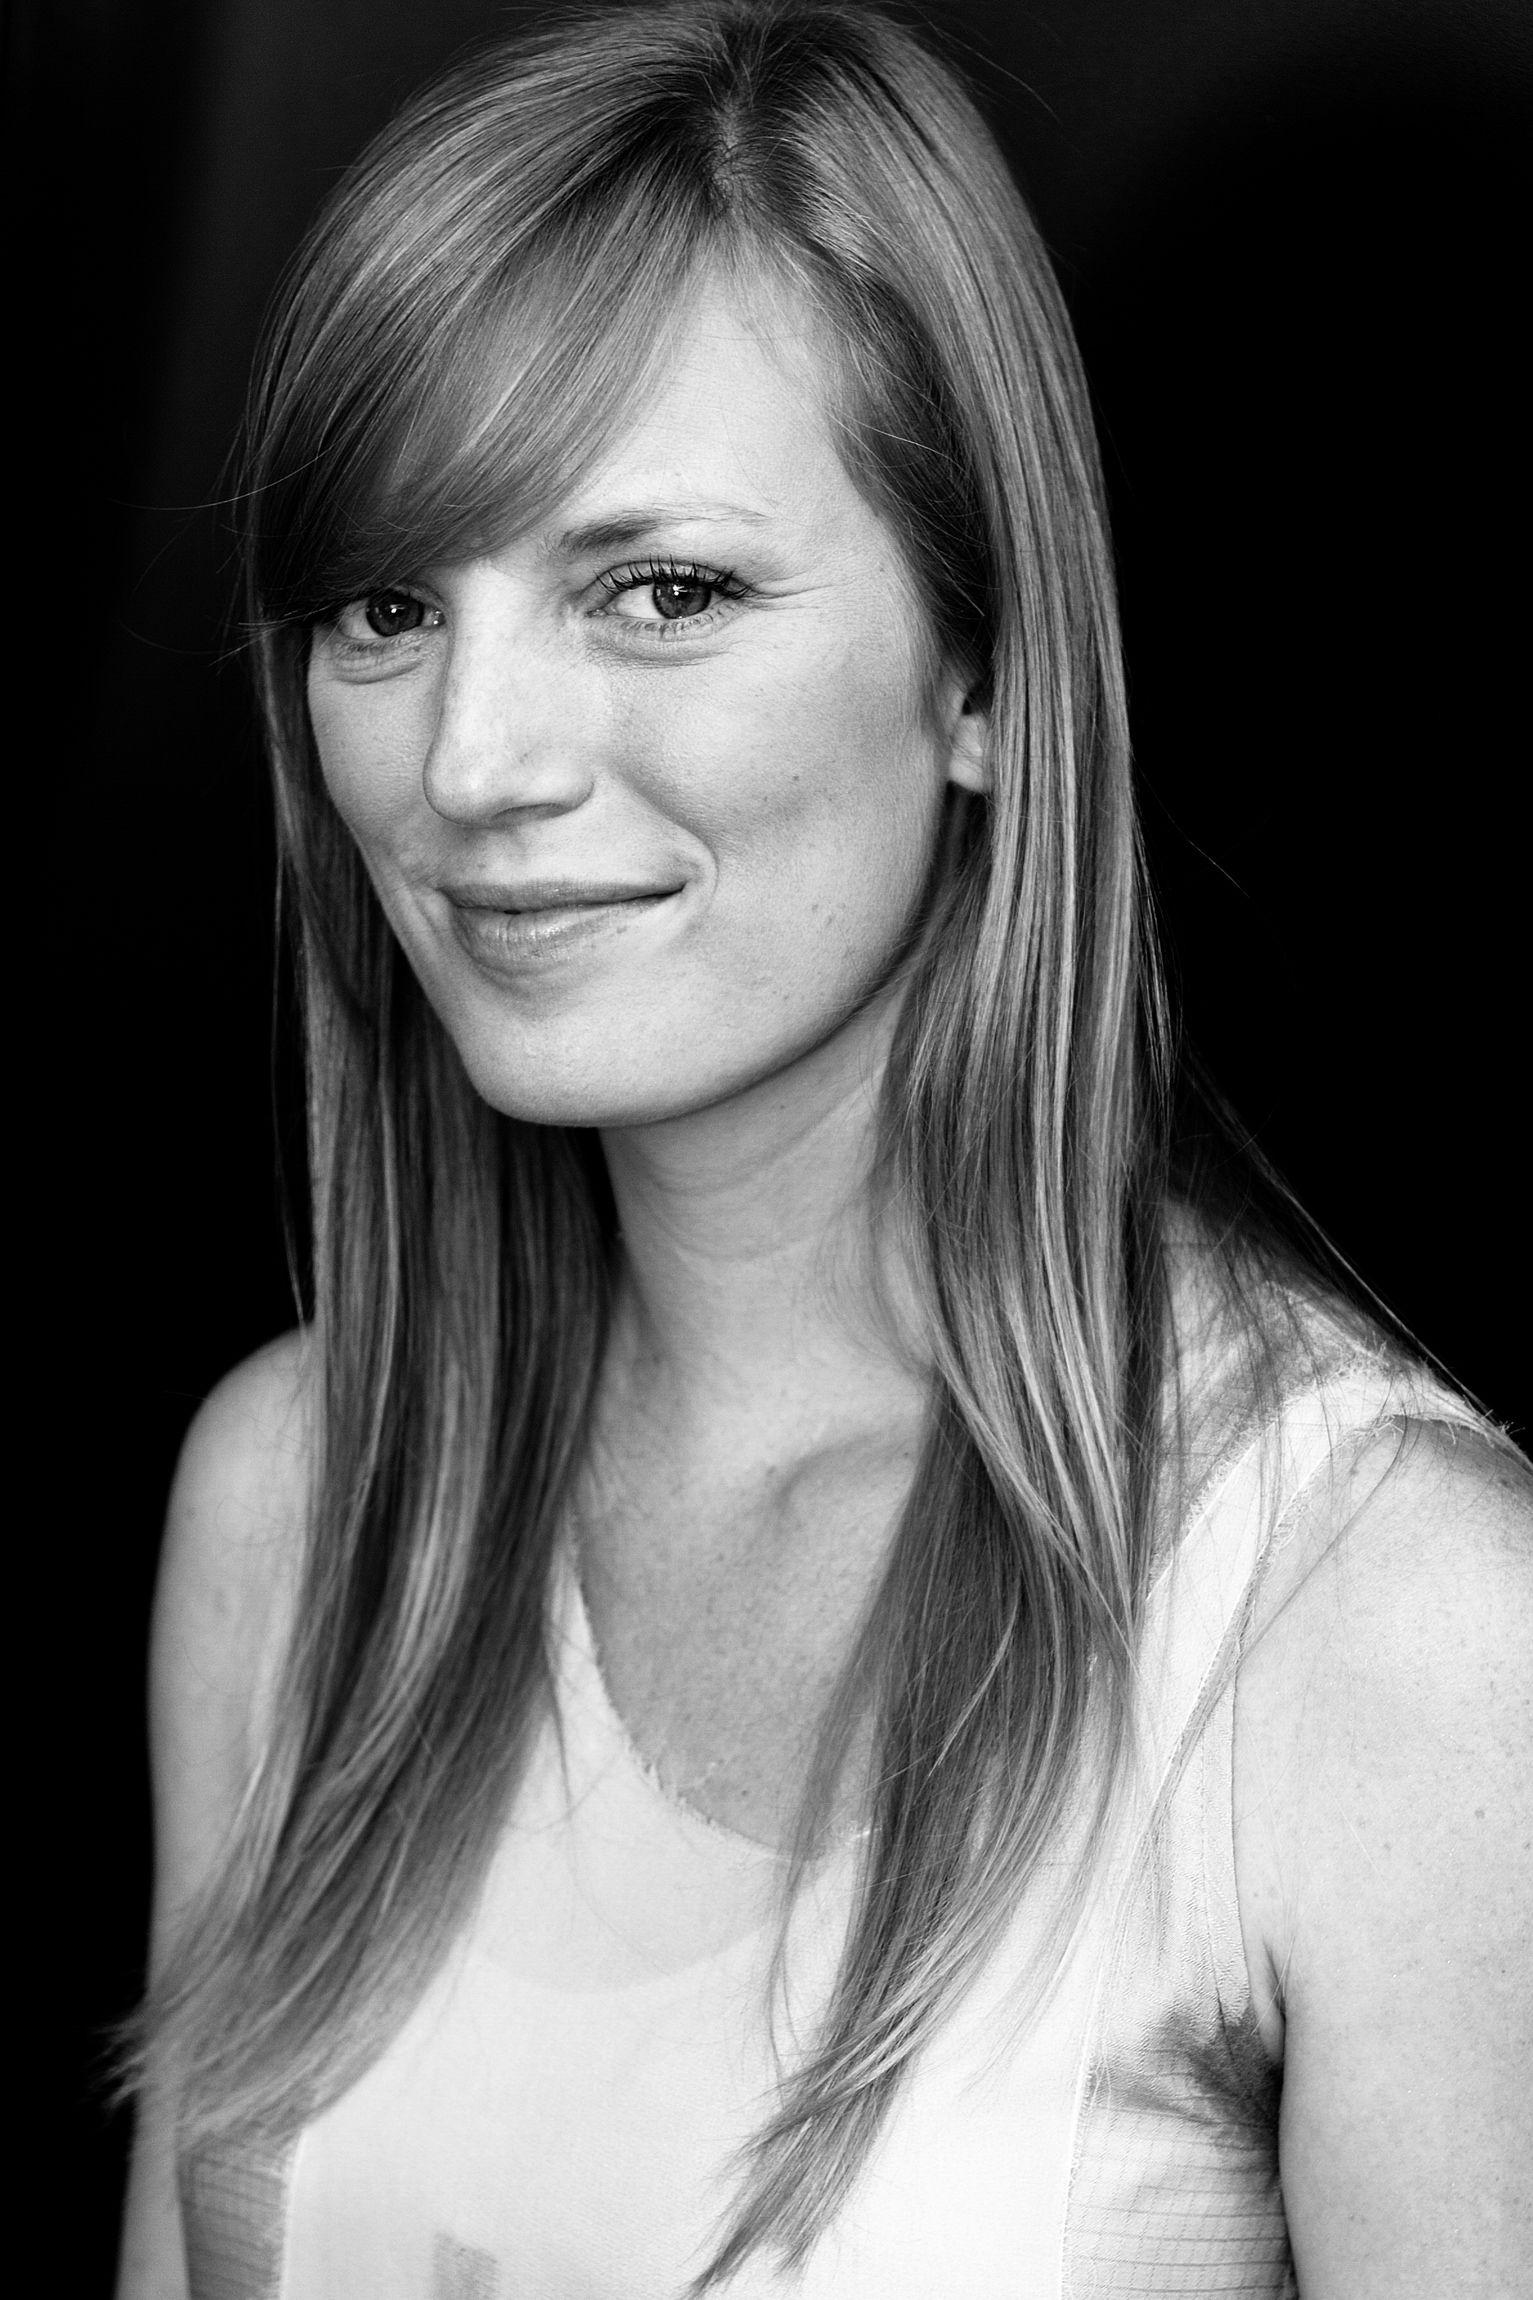 Photo of Sarah Polley: Canadian actress, film director and screenwriter